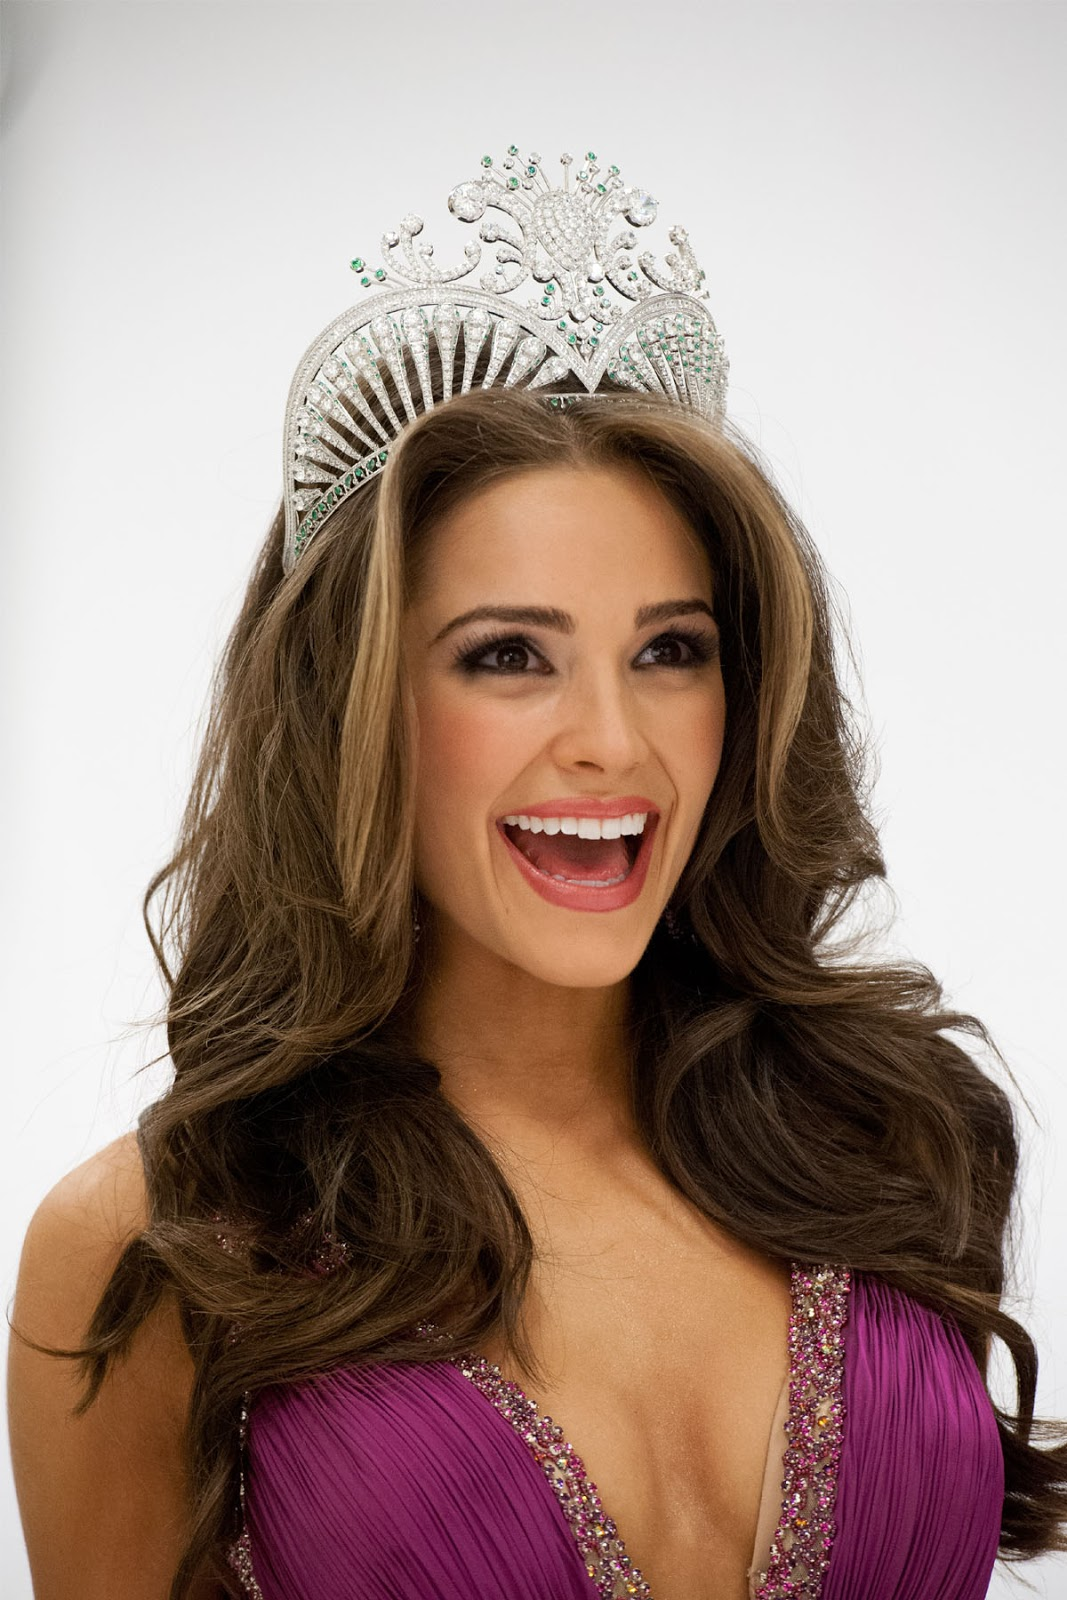 Olivia Culpo Miss Universe 2012 Hd Wallpapers Hd